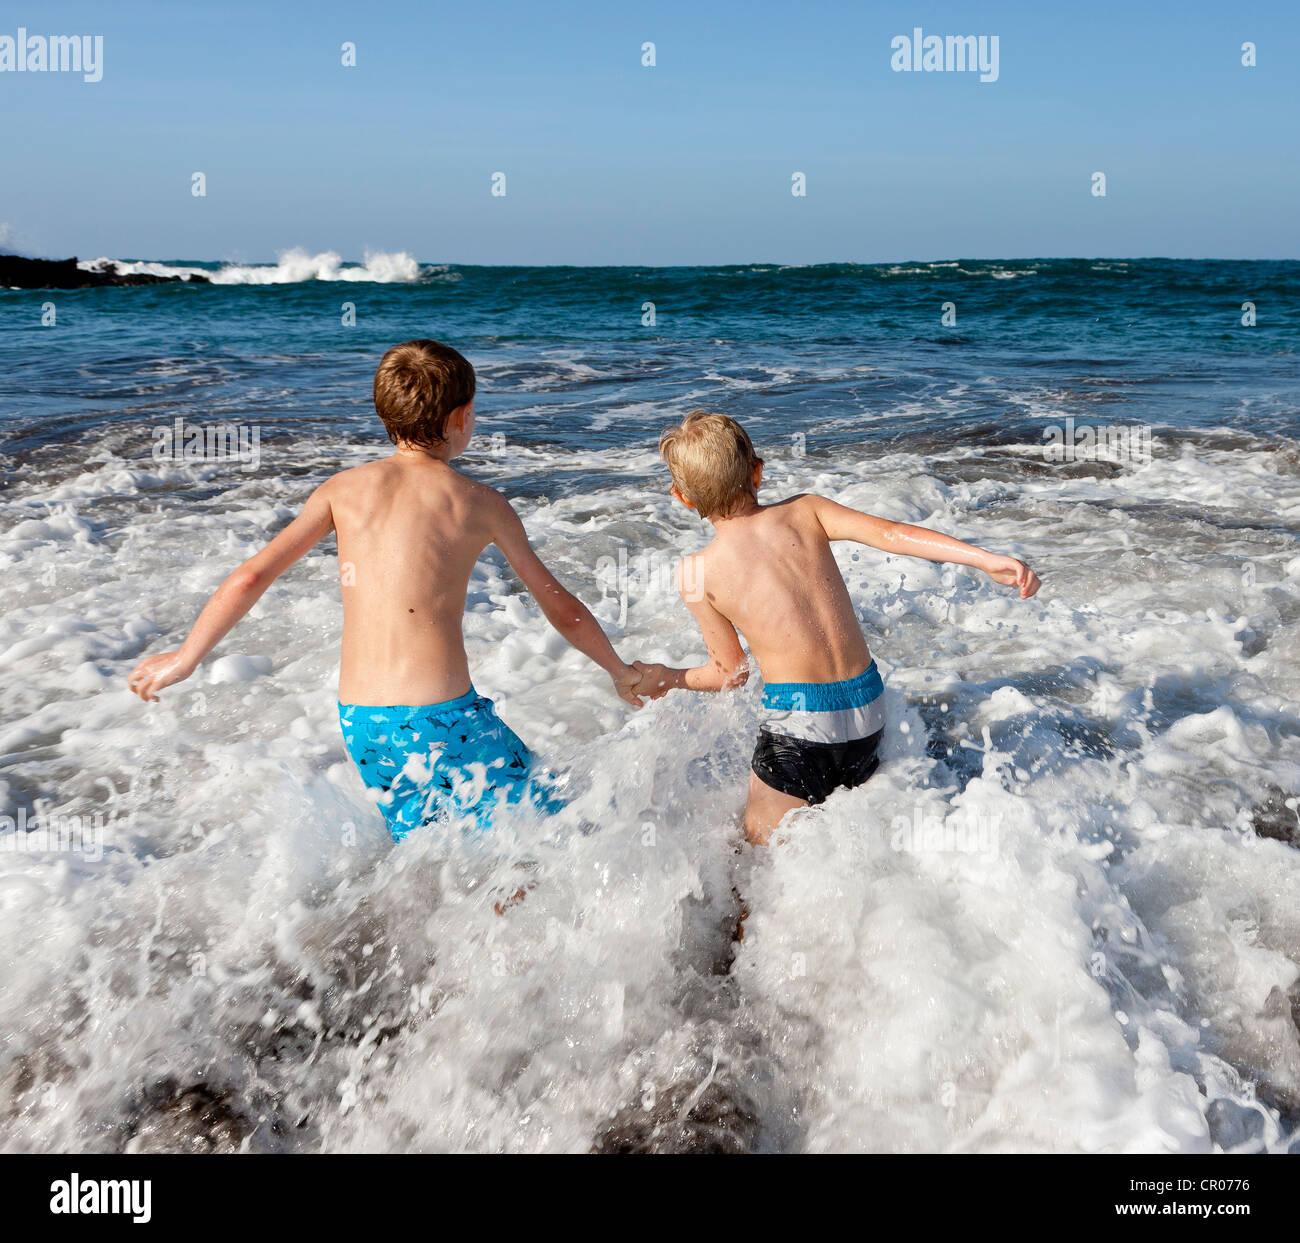 Children playing in the surf, Playa Jardin beach, Puerto de la Cruz, Tenerife, northern part, Canary Islands, Spain, - Stock Image